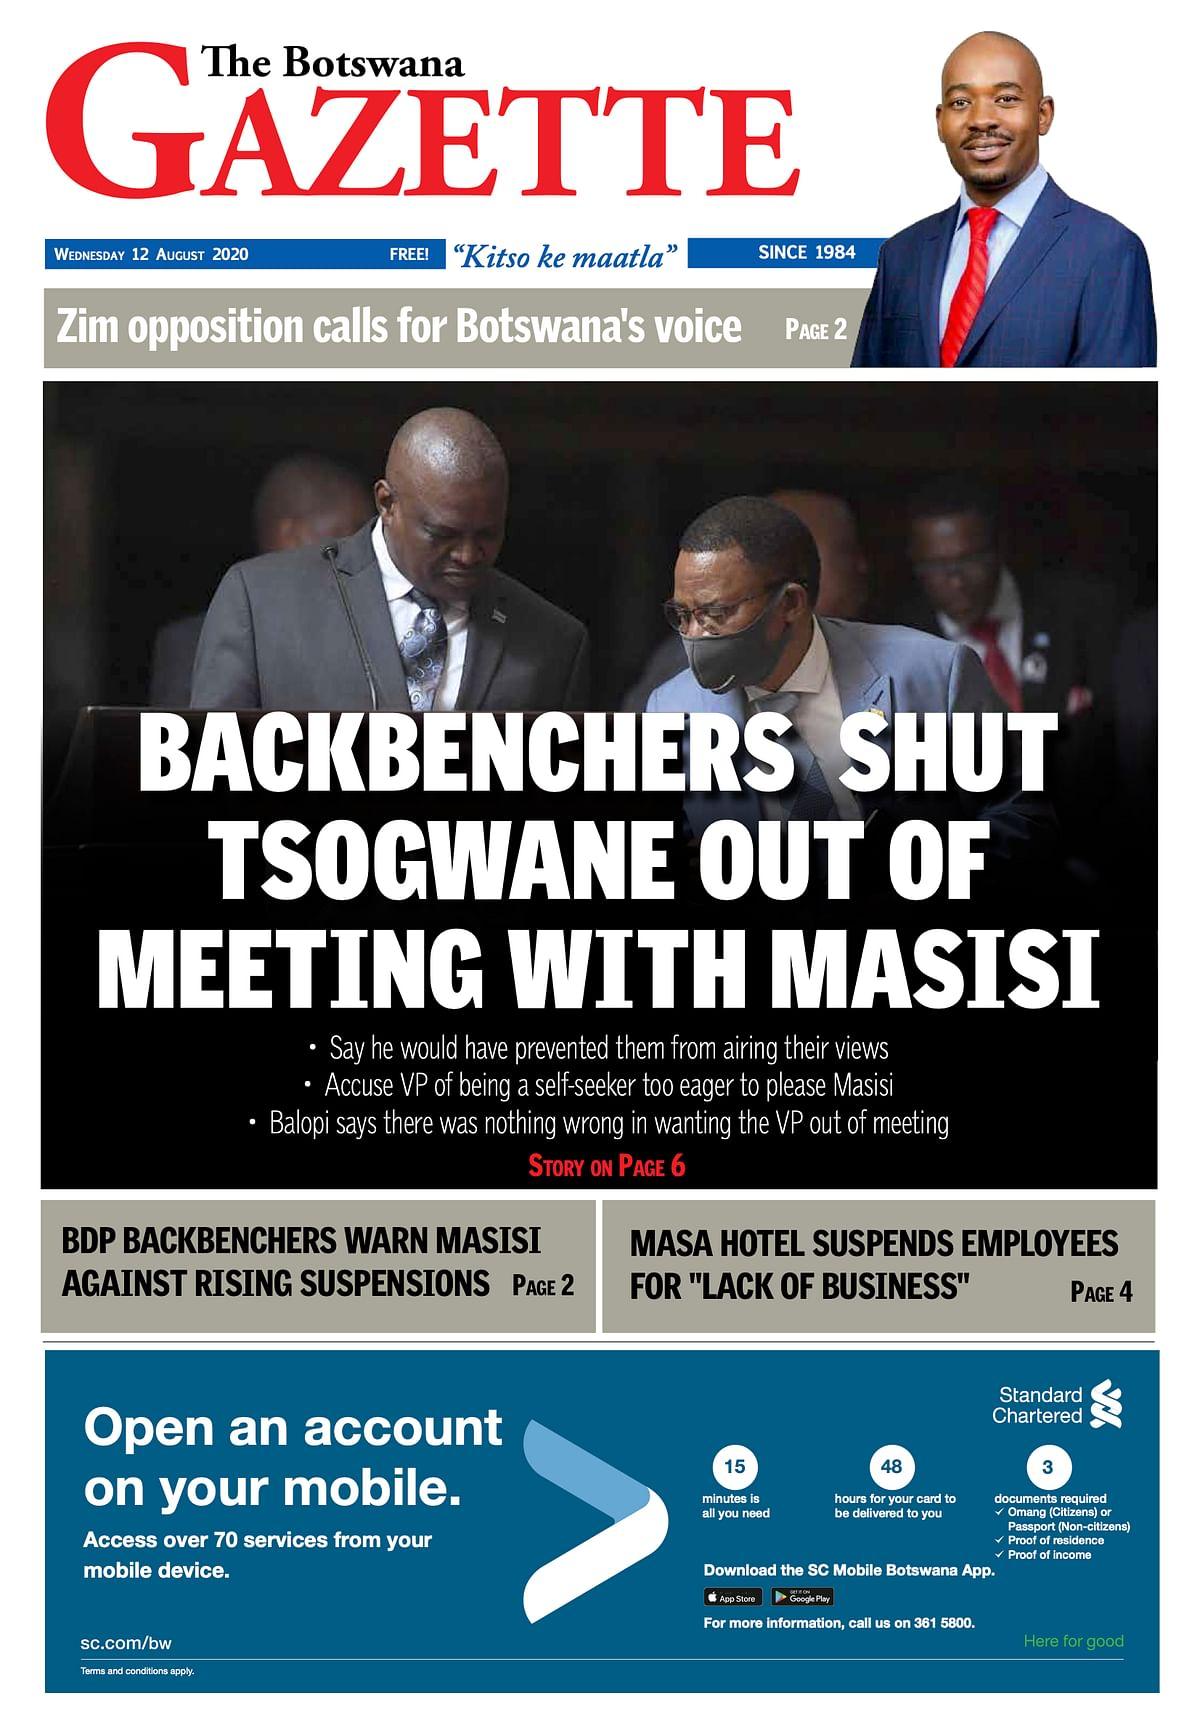 The Botswana Gazette 12 August 2020